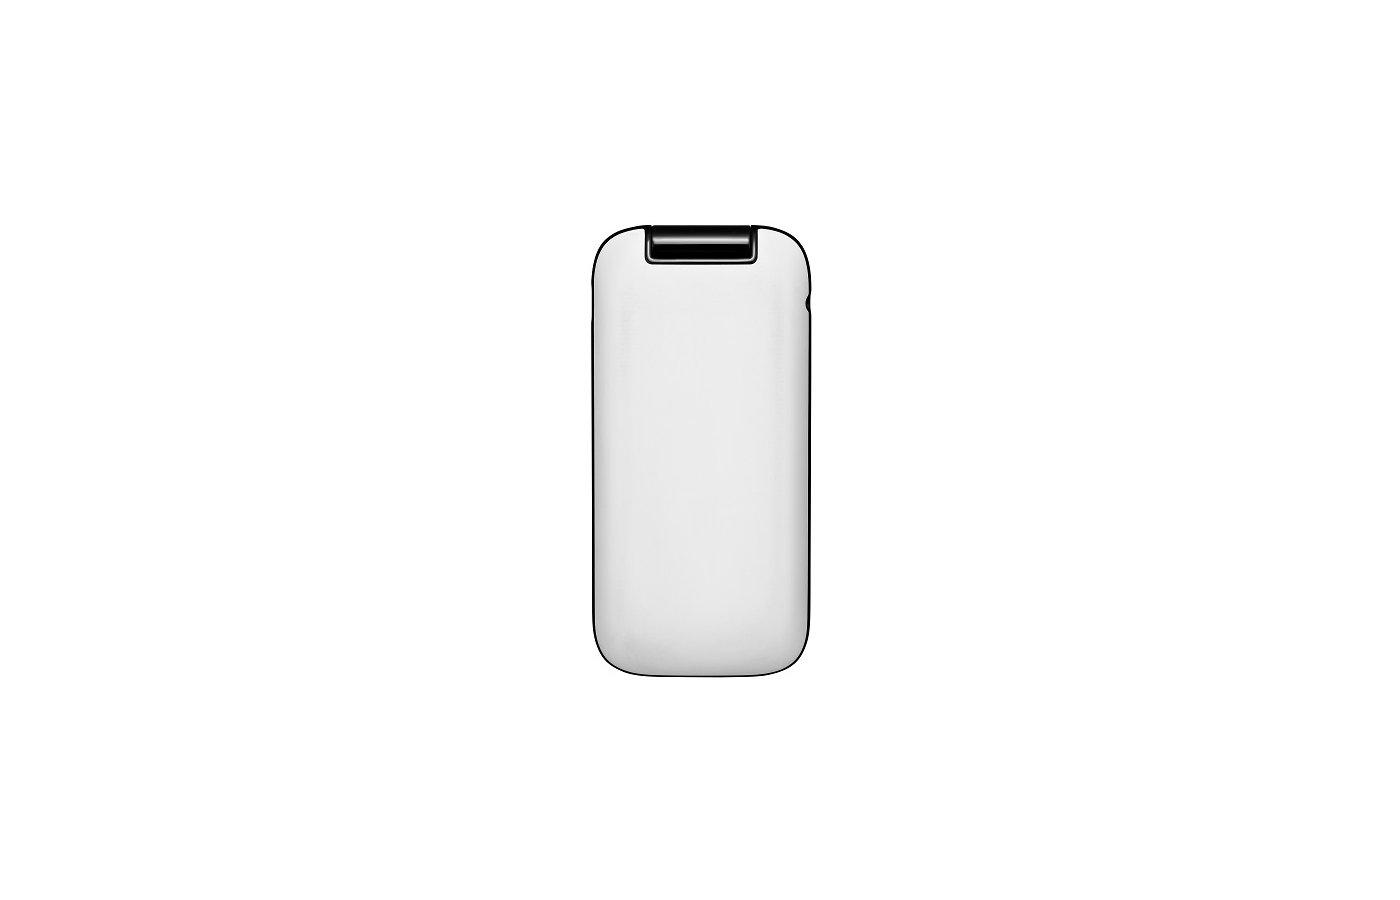 Мобильный телефон Alcatel 1035D Pure White